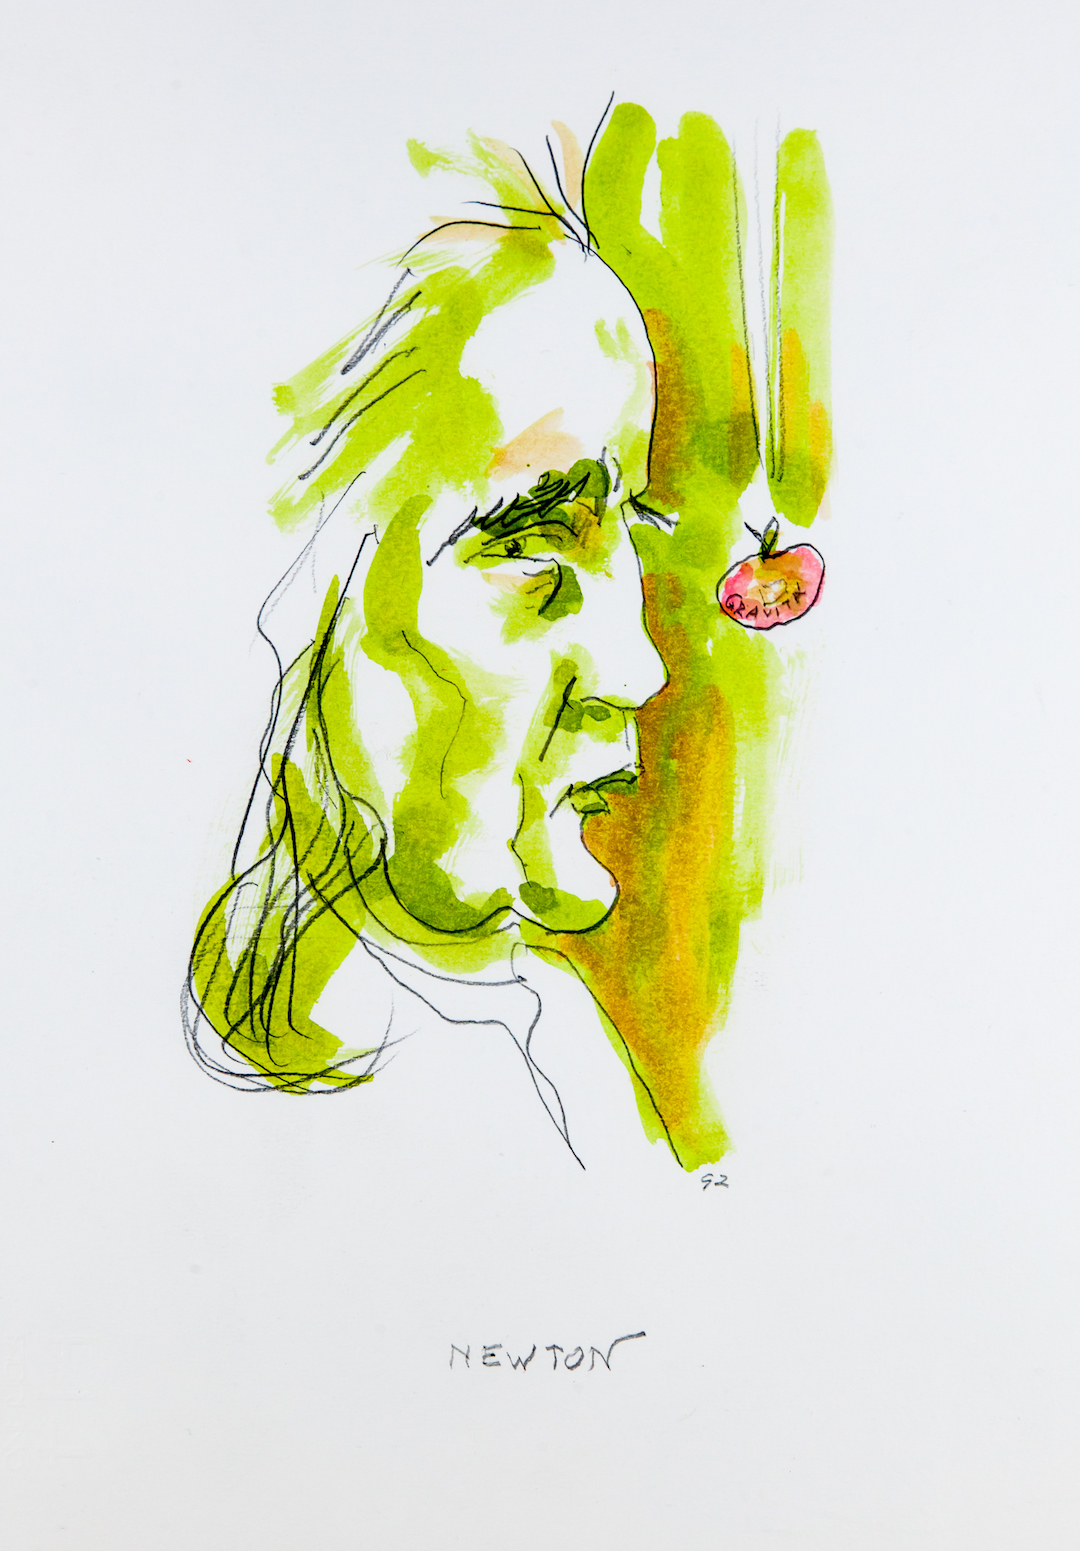 Isaac Newton, caricatura